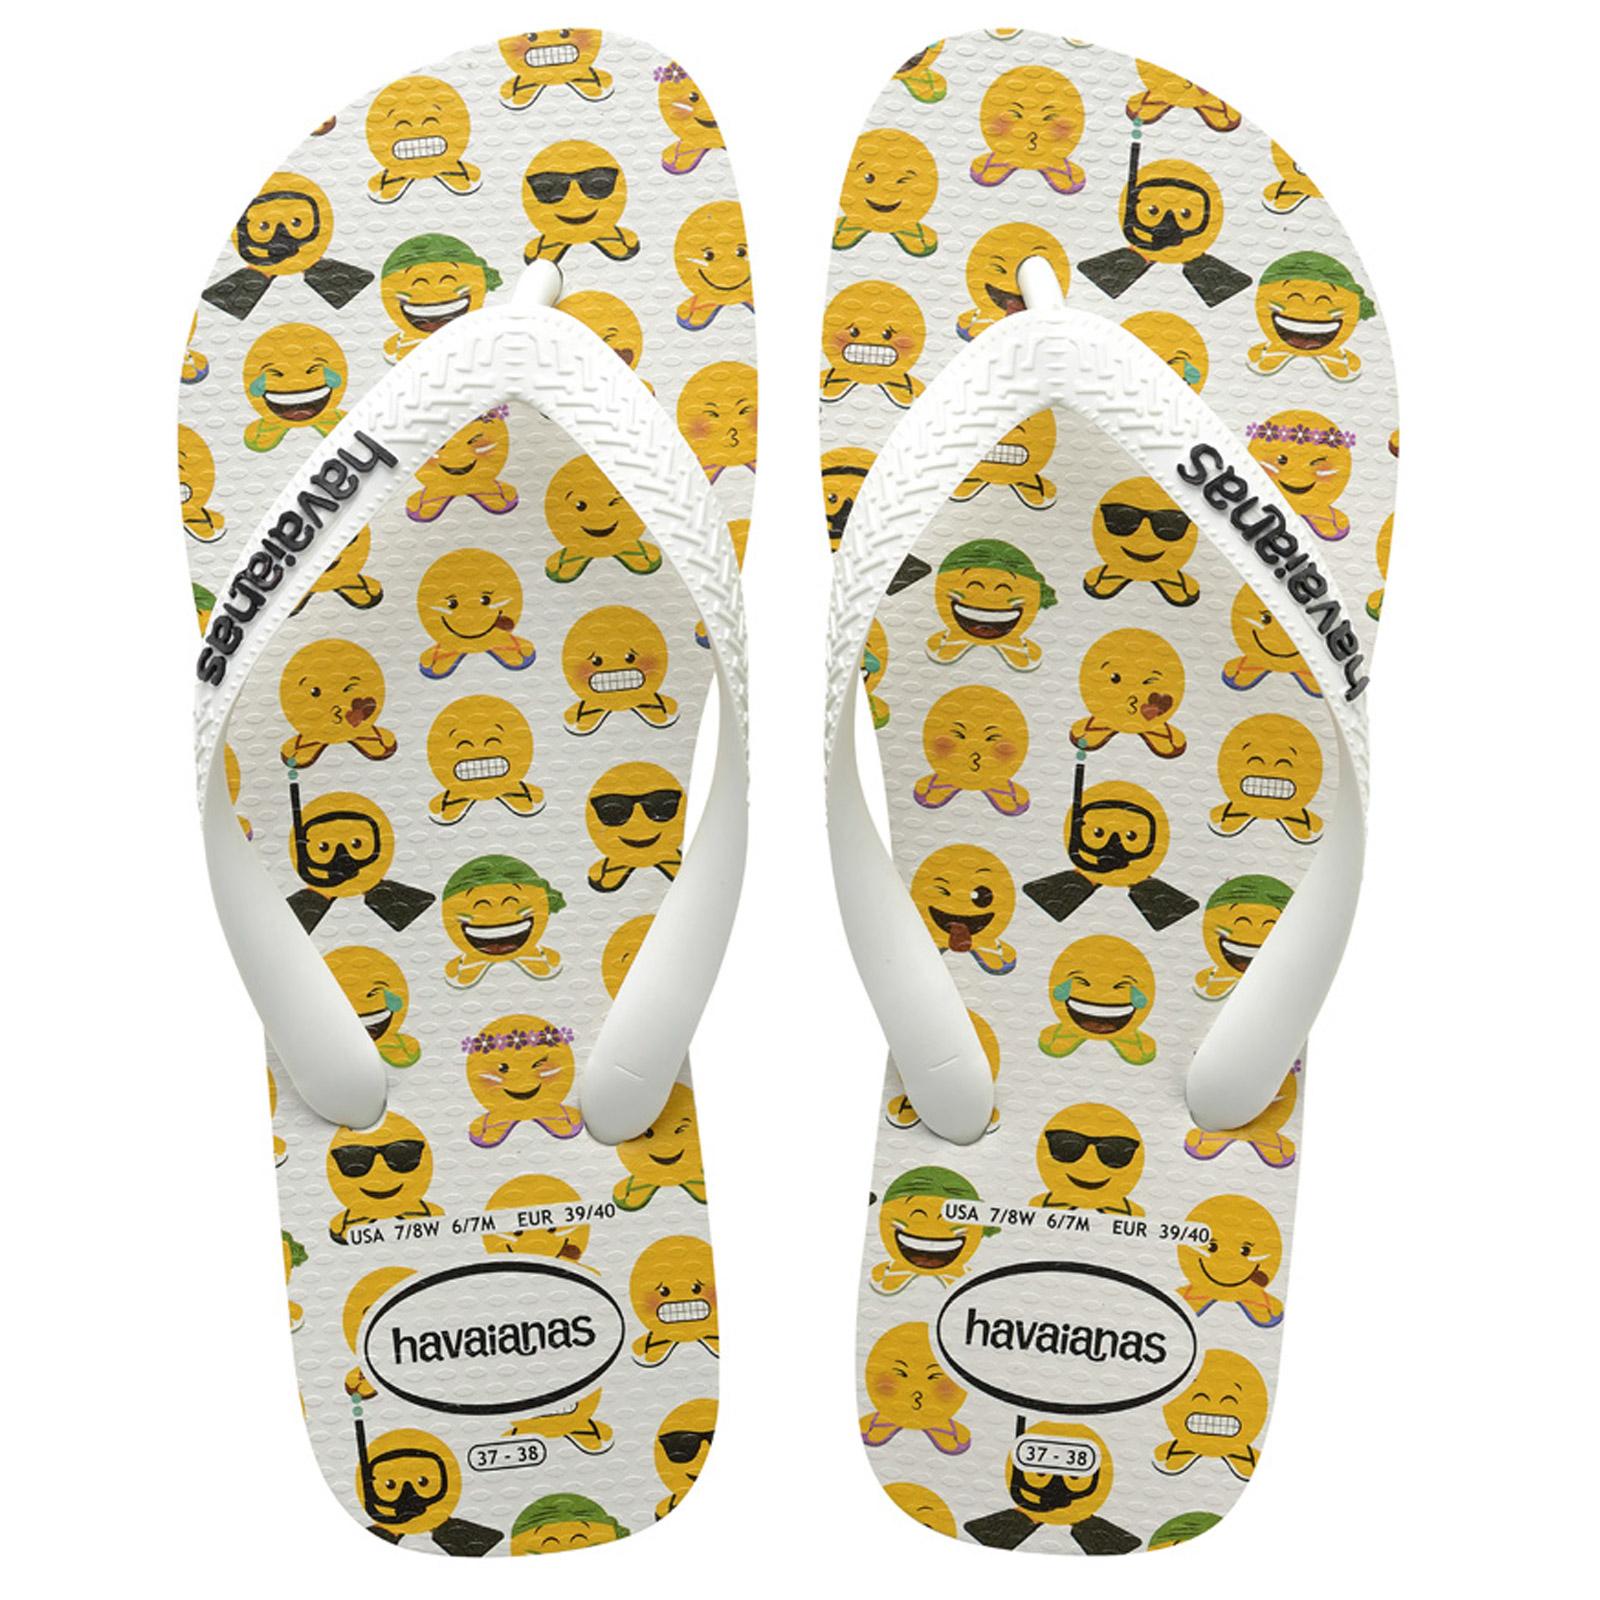 Havaianas Mood Minions Beach Flip Flops Size UK 3-12